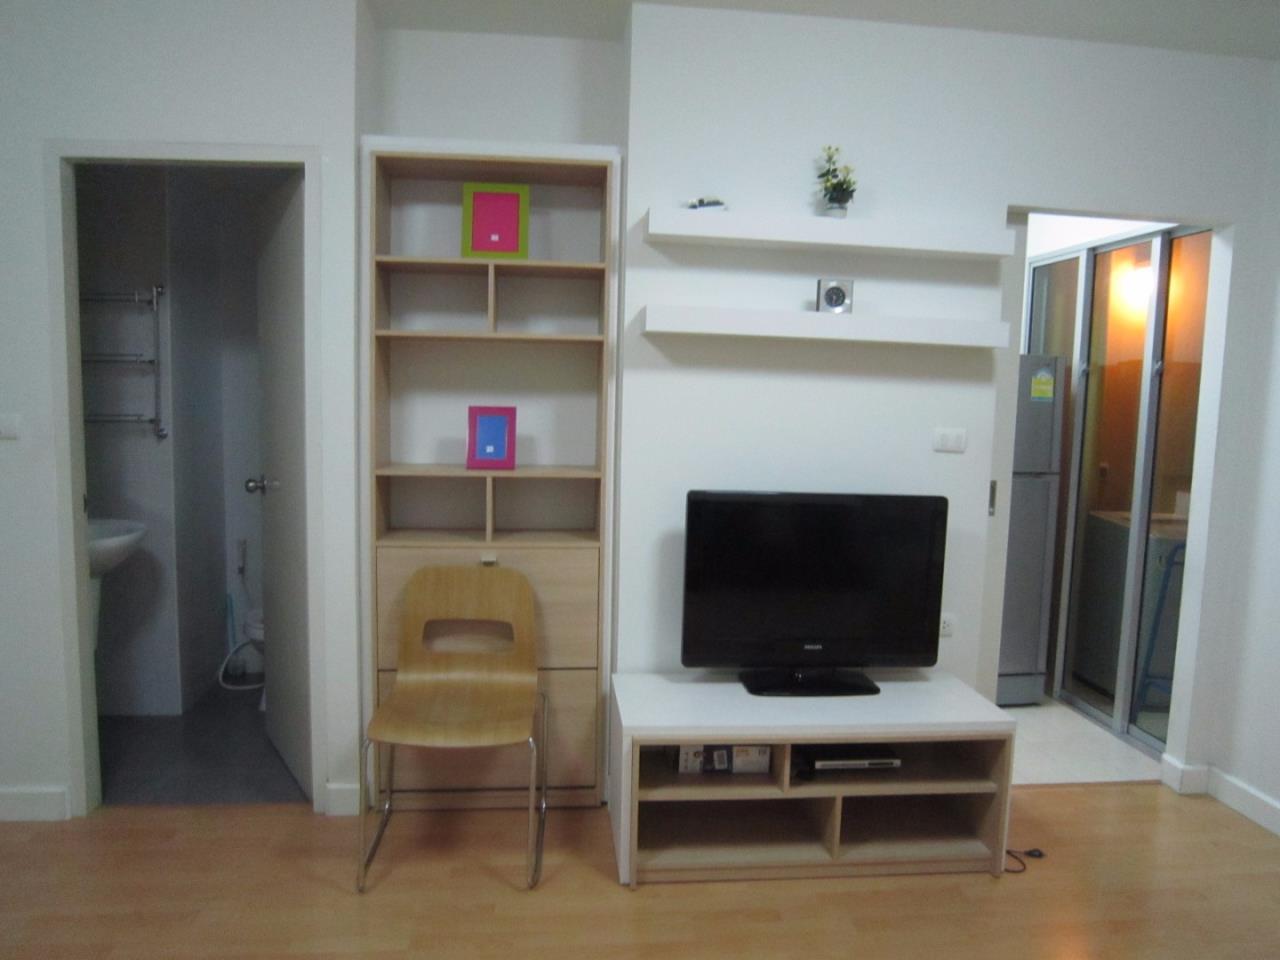 Quality Life Property Agency's S A L E! My Condo Sukhumvit 52 | 1 BED 1 BATH | 35.4 SQ. M. 3